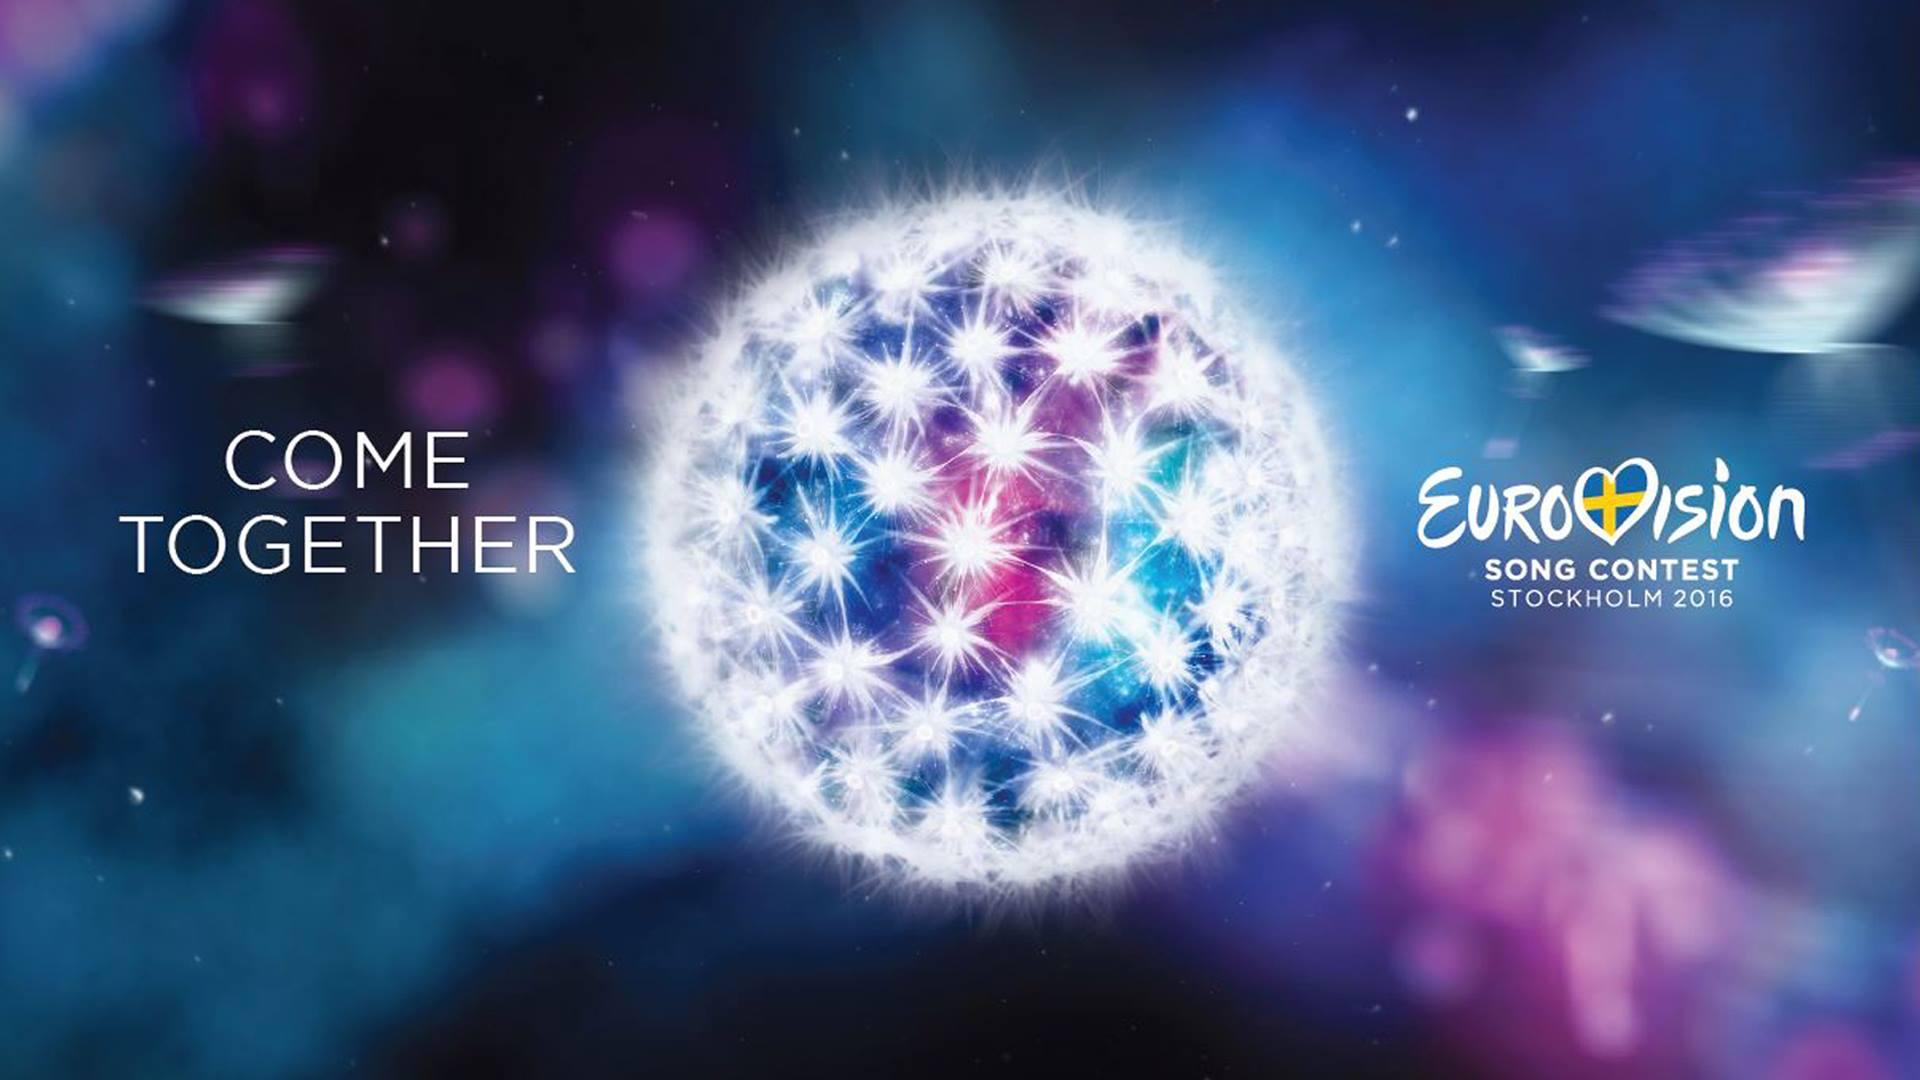 eurovision 2016 logo l 39 eurovision au quotidien. Black Bedroom Furniture Sets. Home Design Ideas